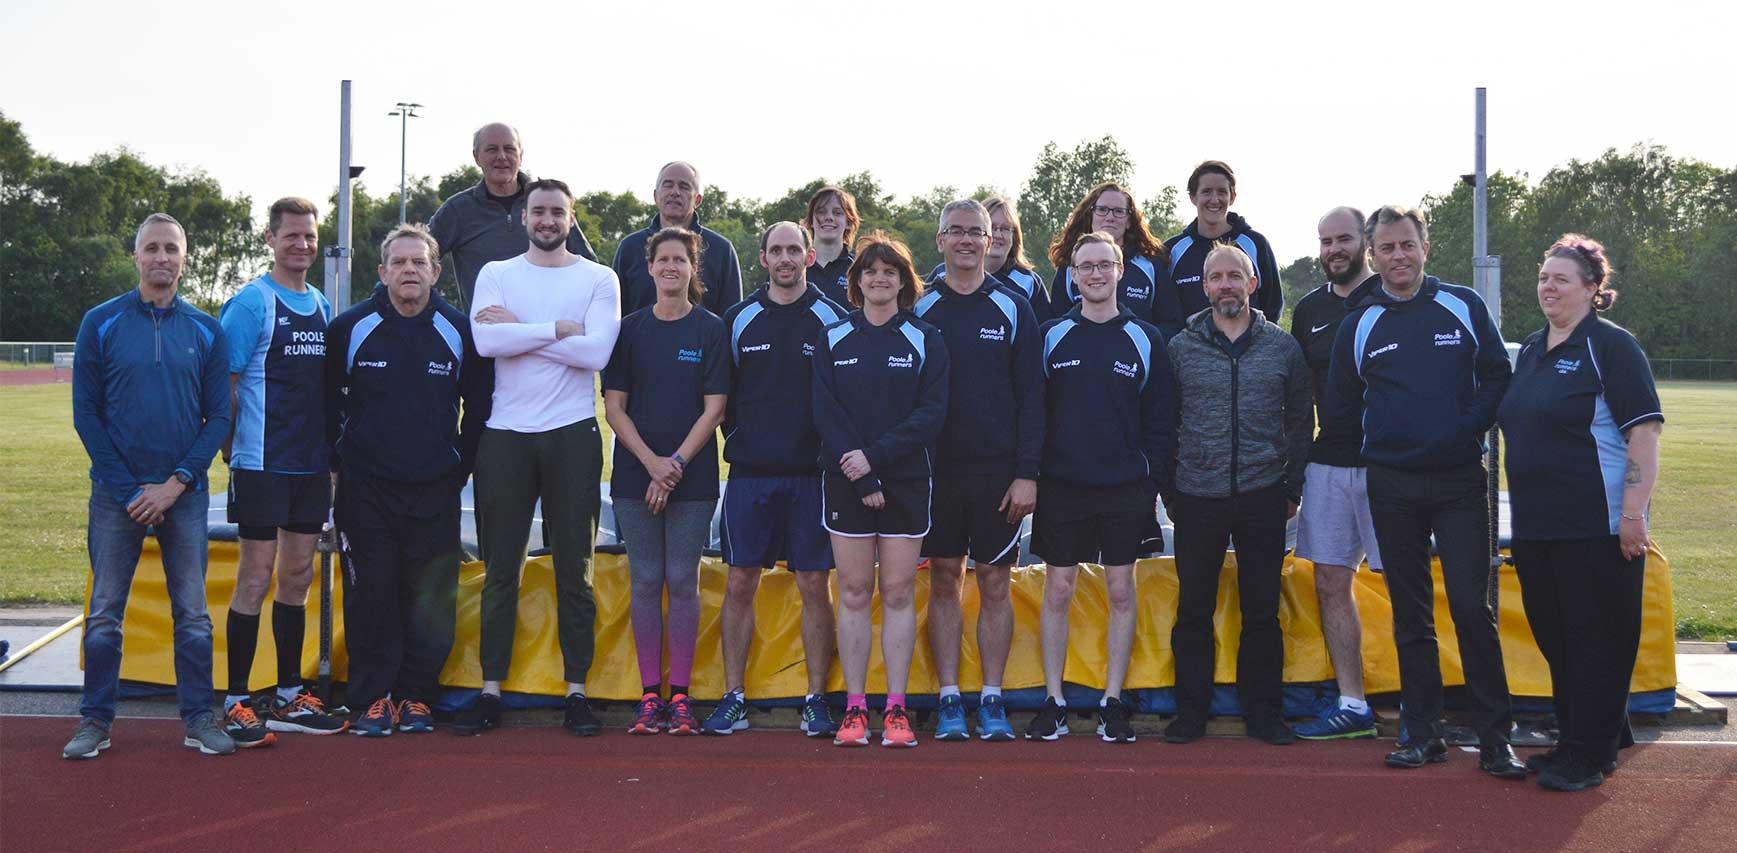 Coaches - Junior Athletics Club - Poole Runners